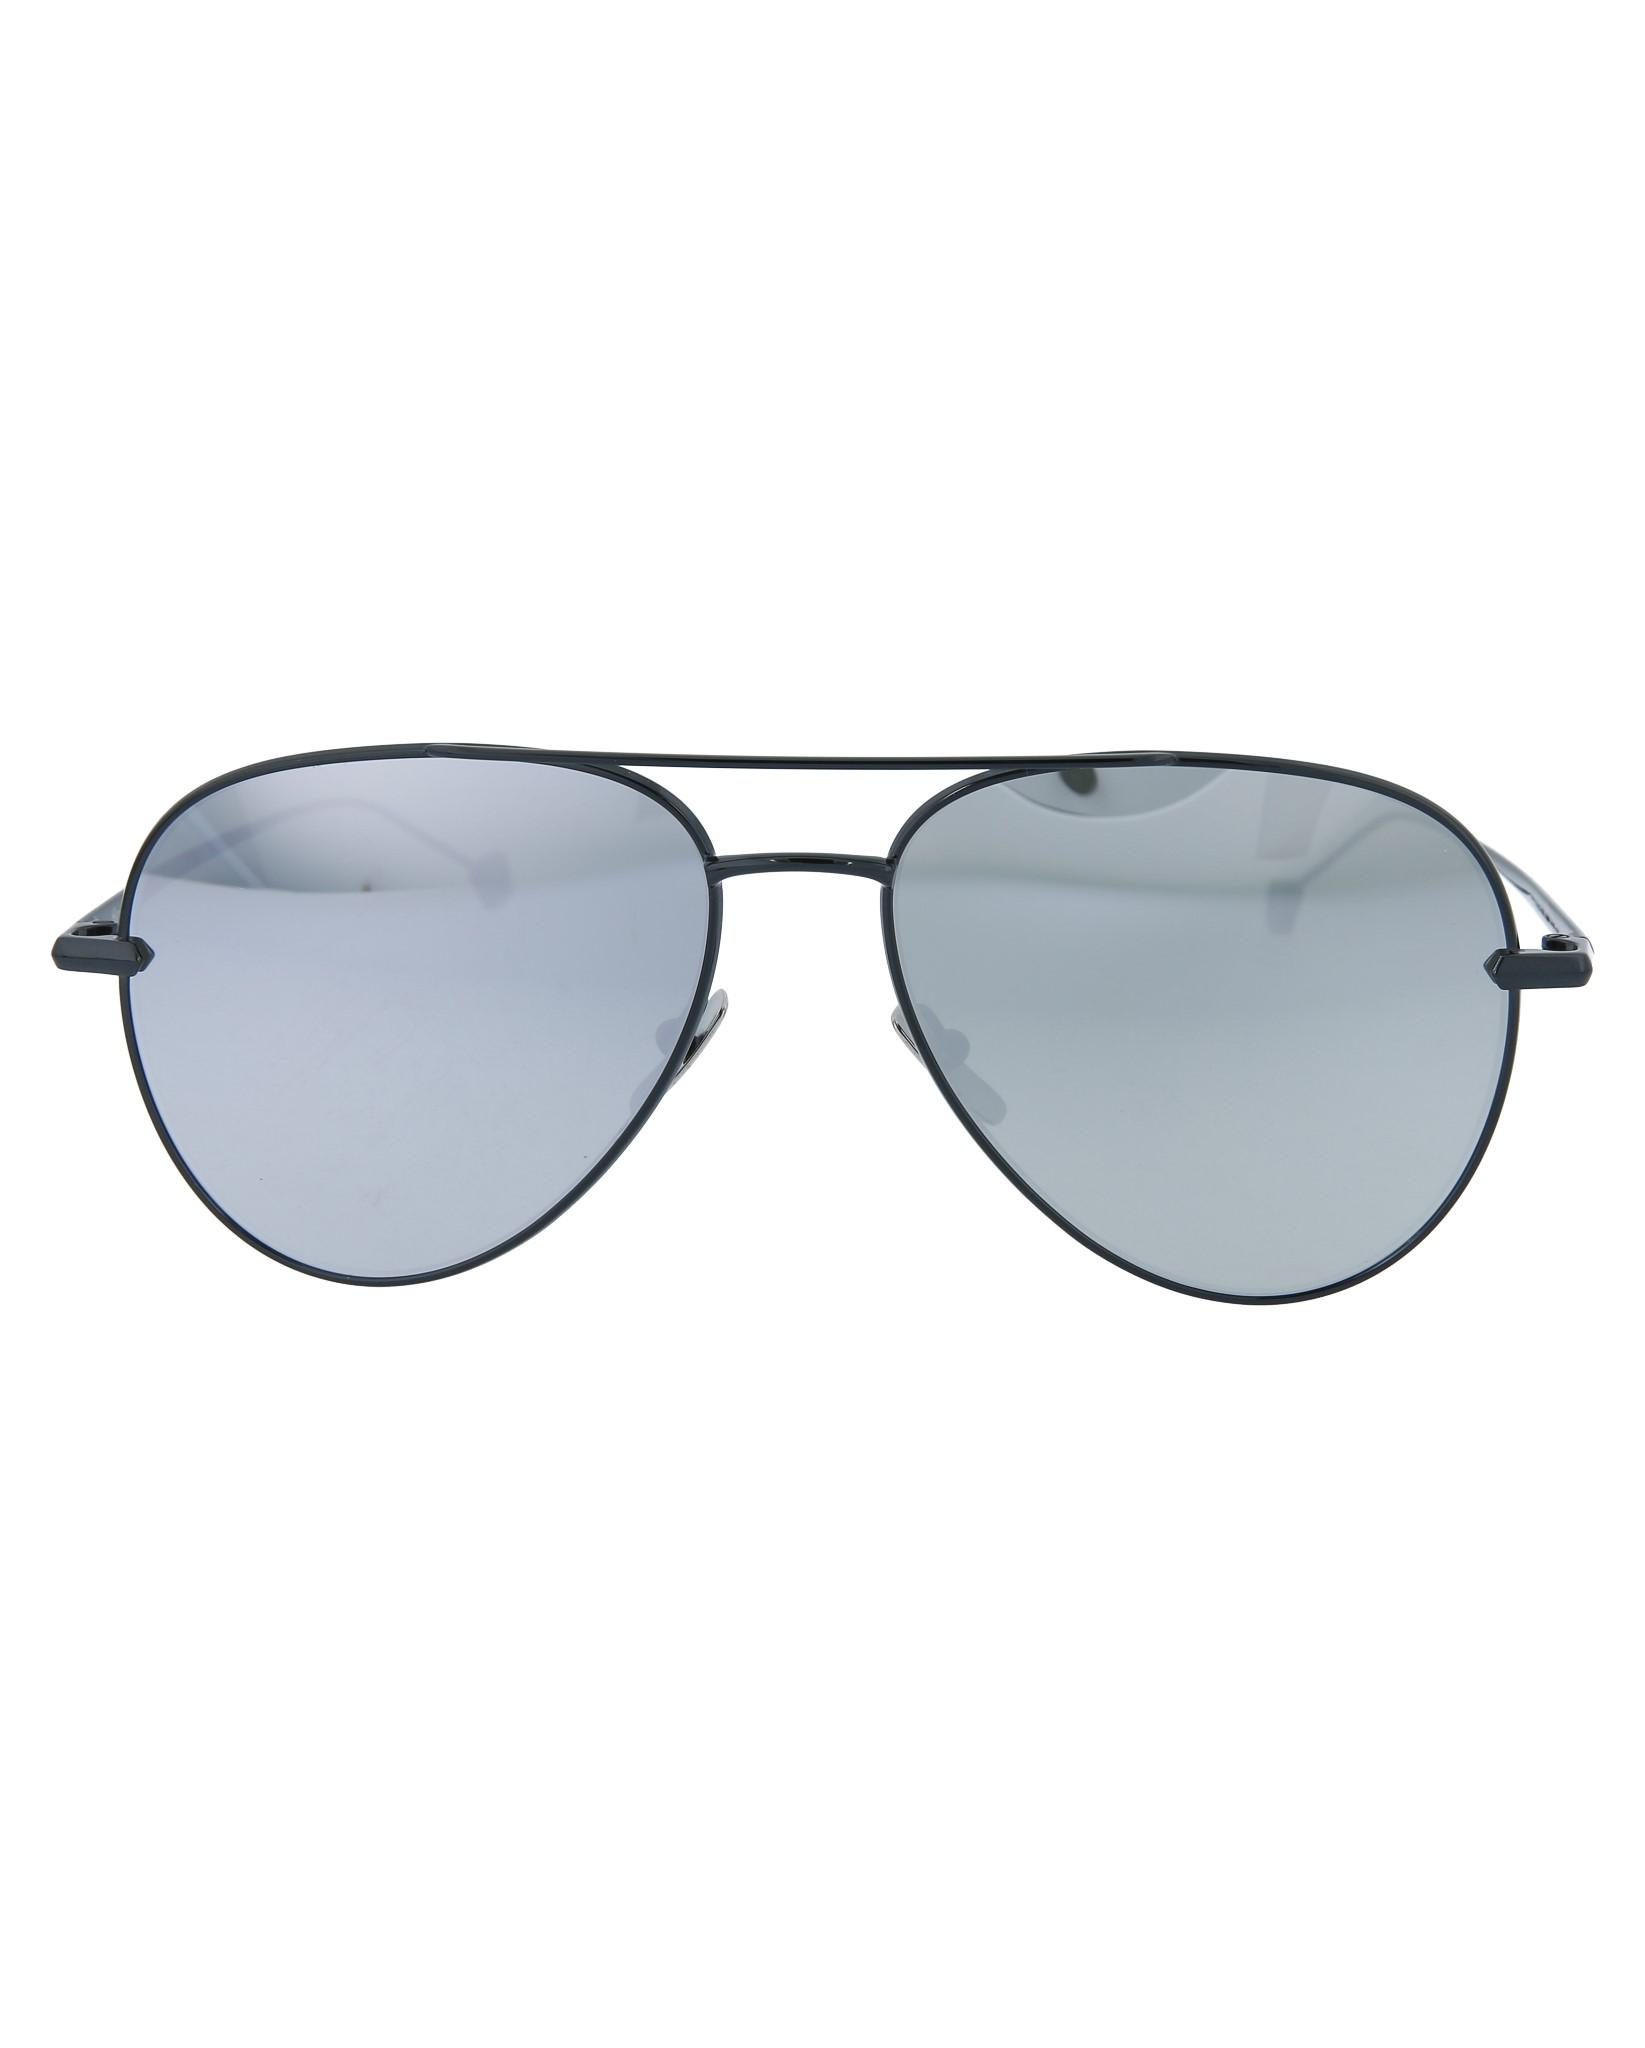 2a19c47ea7 Brioni Mens Aviator Sunglasses BR0025S-30001493-003 191966039323